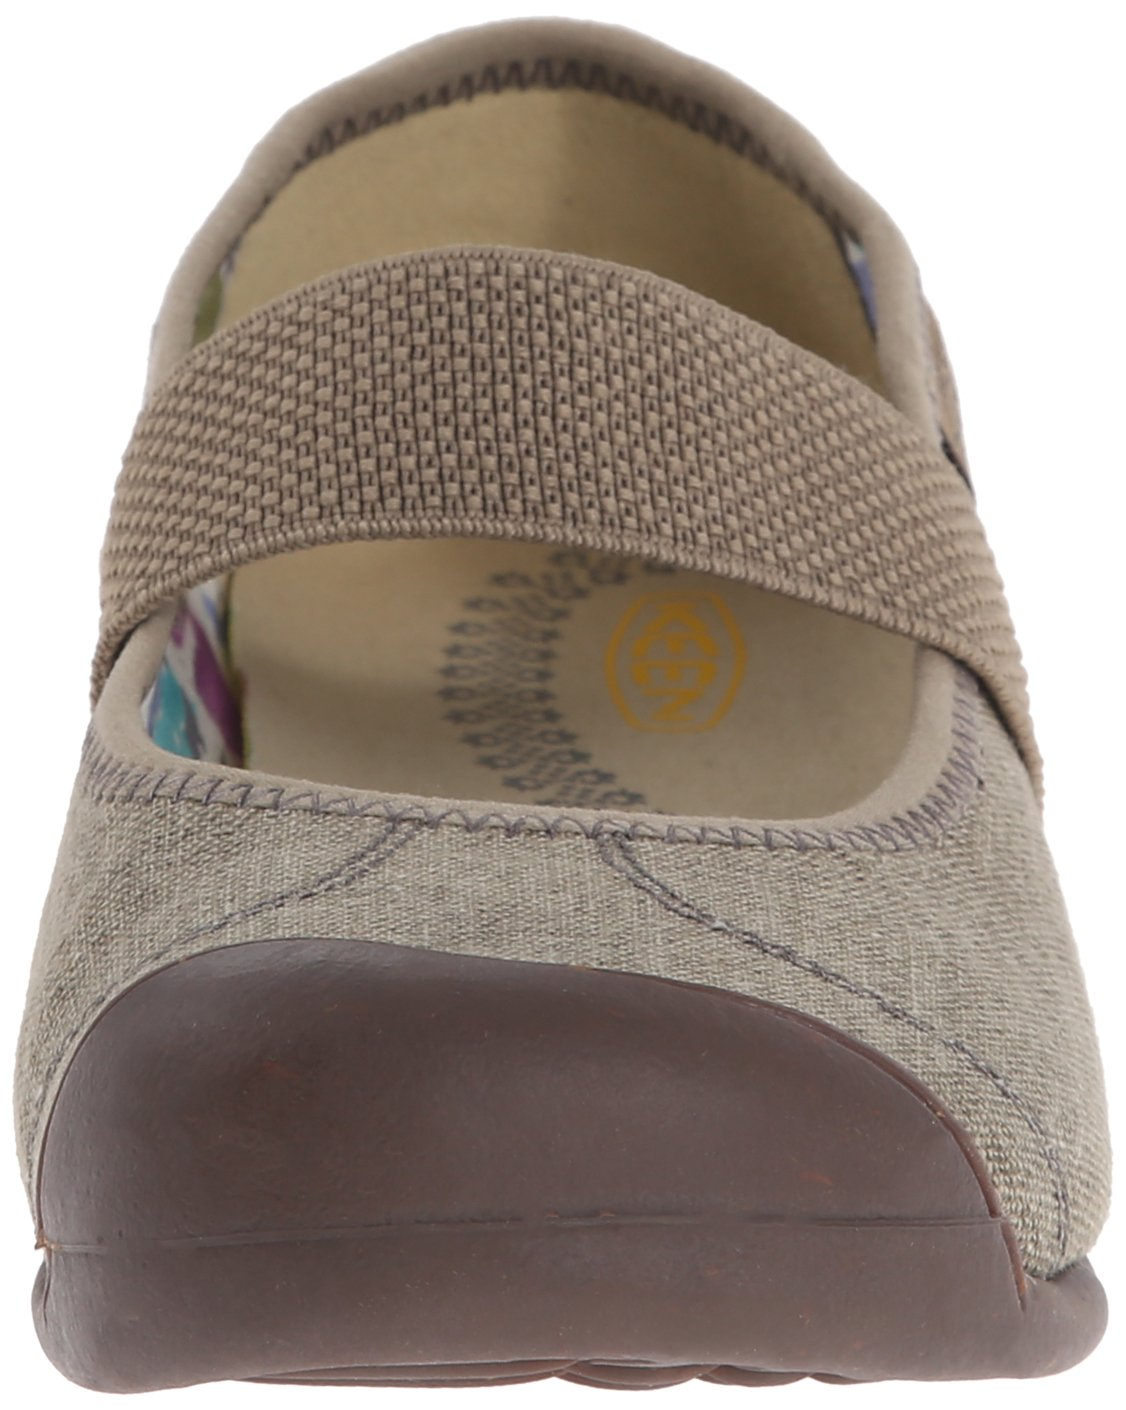 KEEN Women's Sienna MJ Canvas Shoe B00ZFM6MYQ 10.5 B(M) US|Brindle